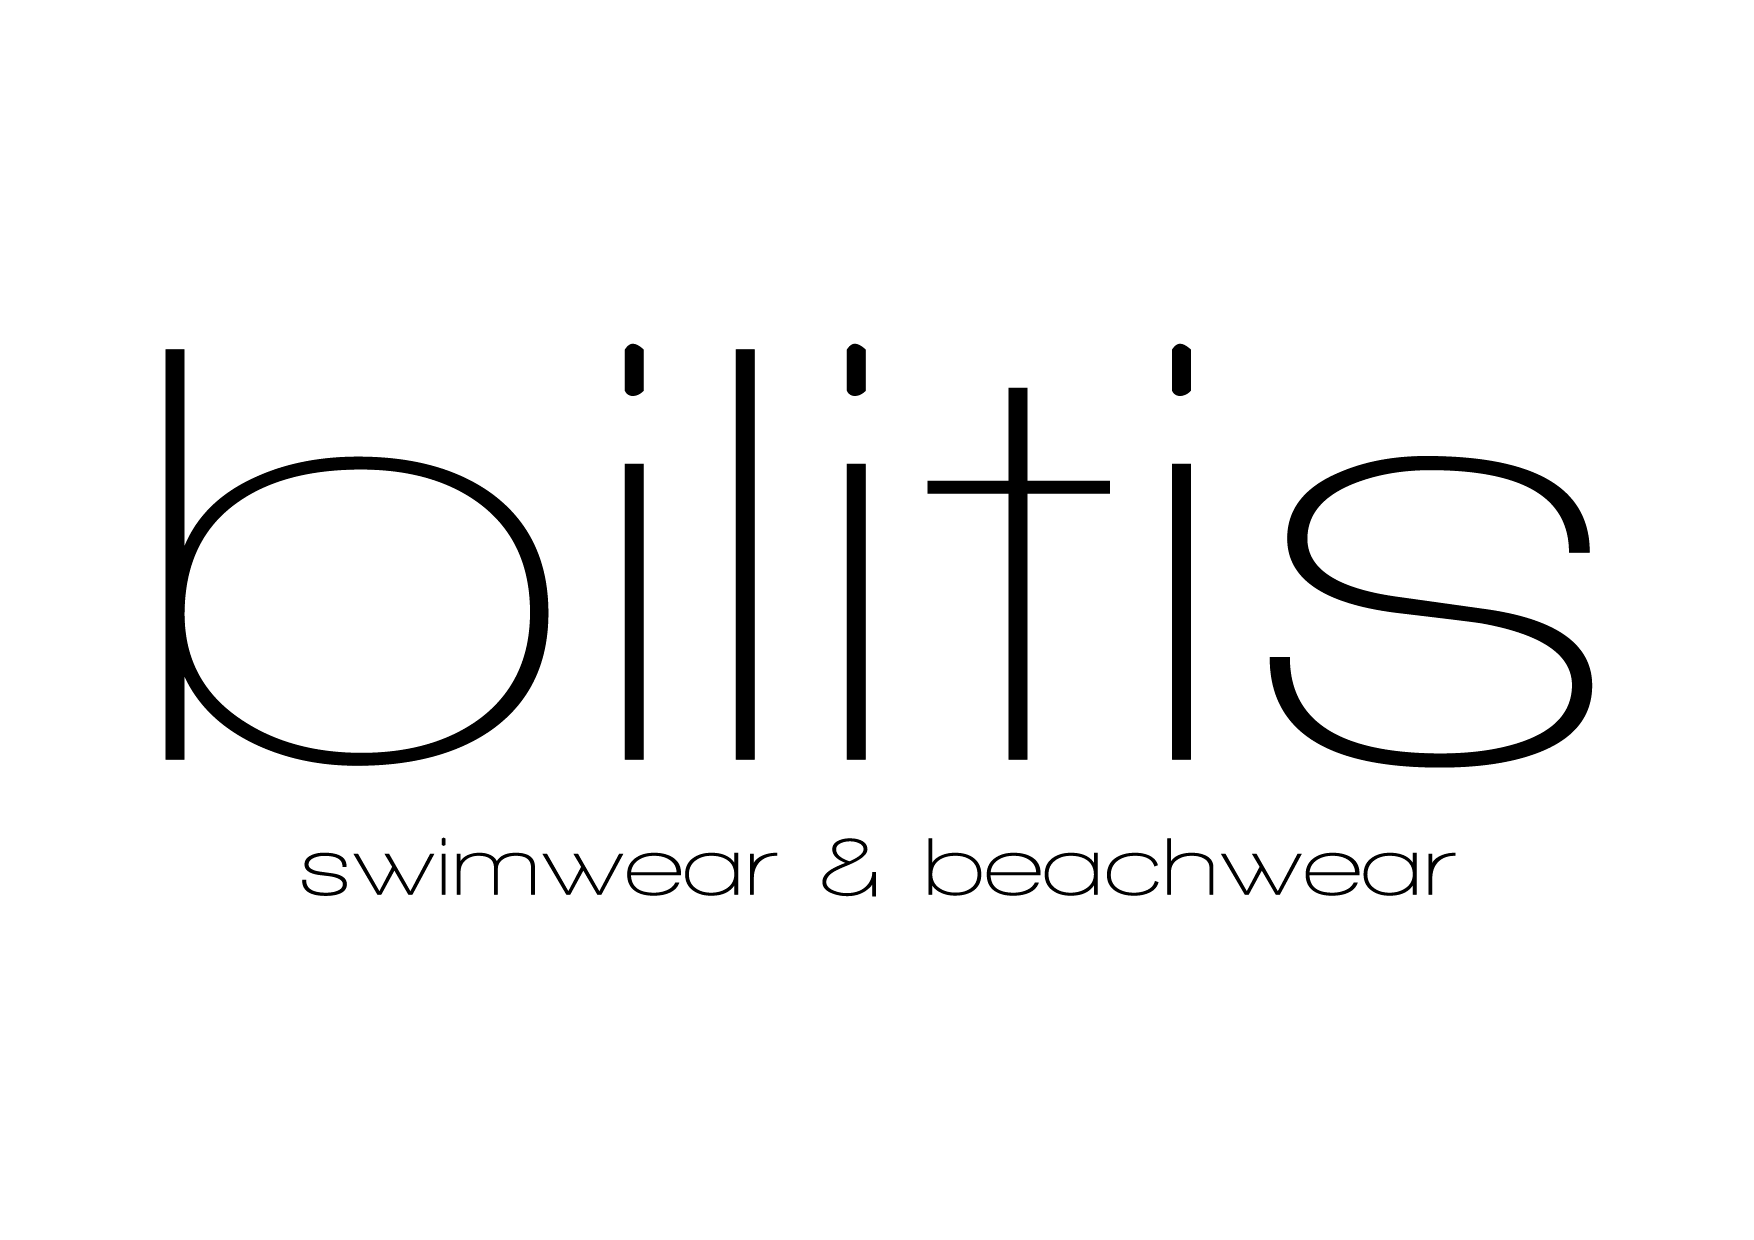 bilitis-LOGO-01